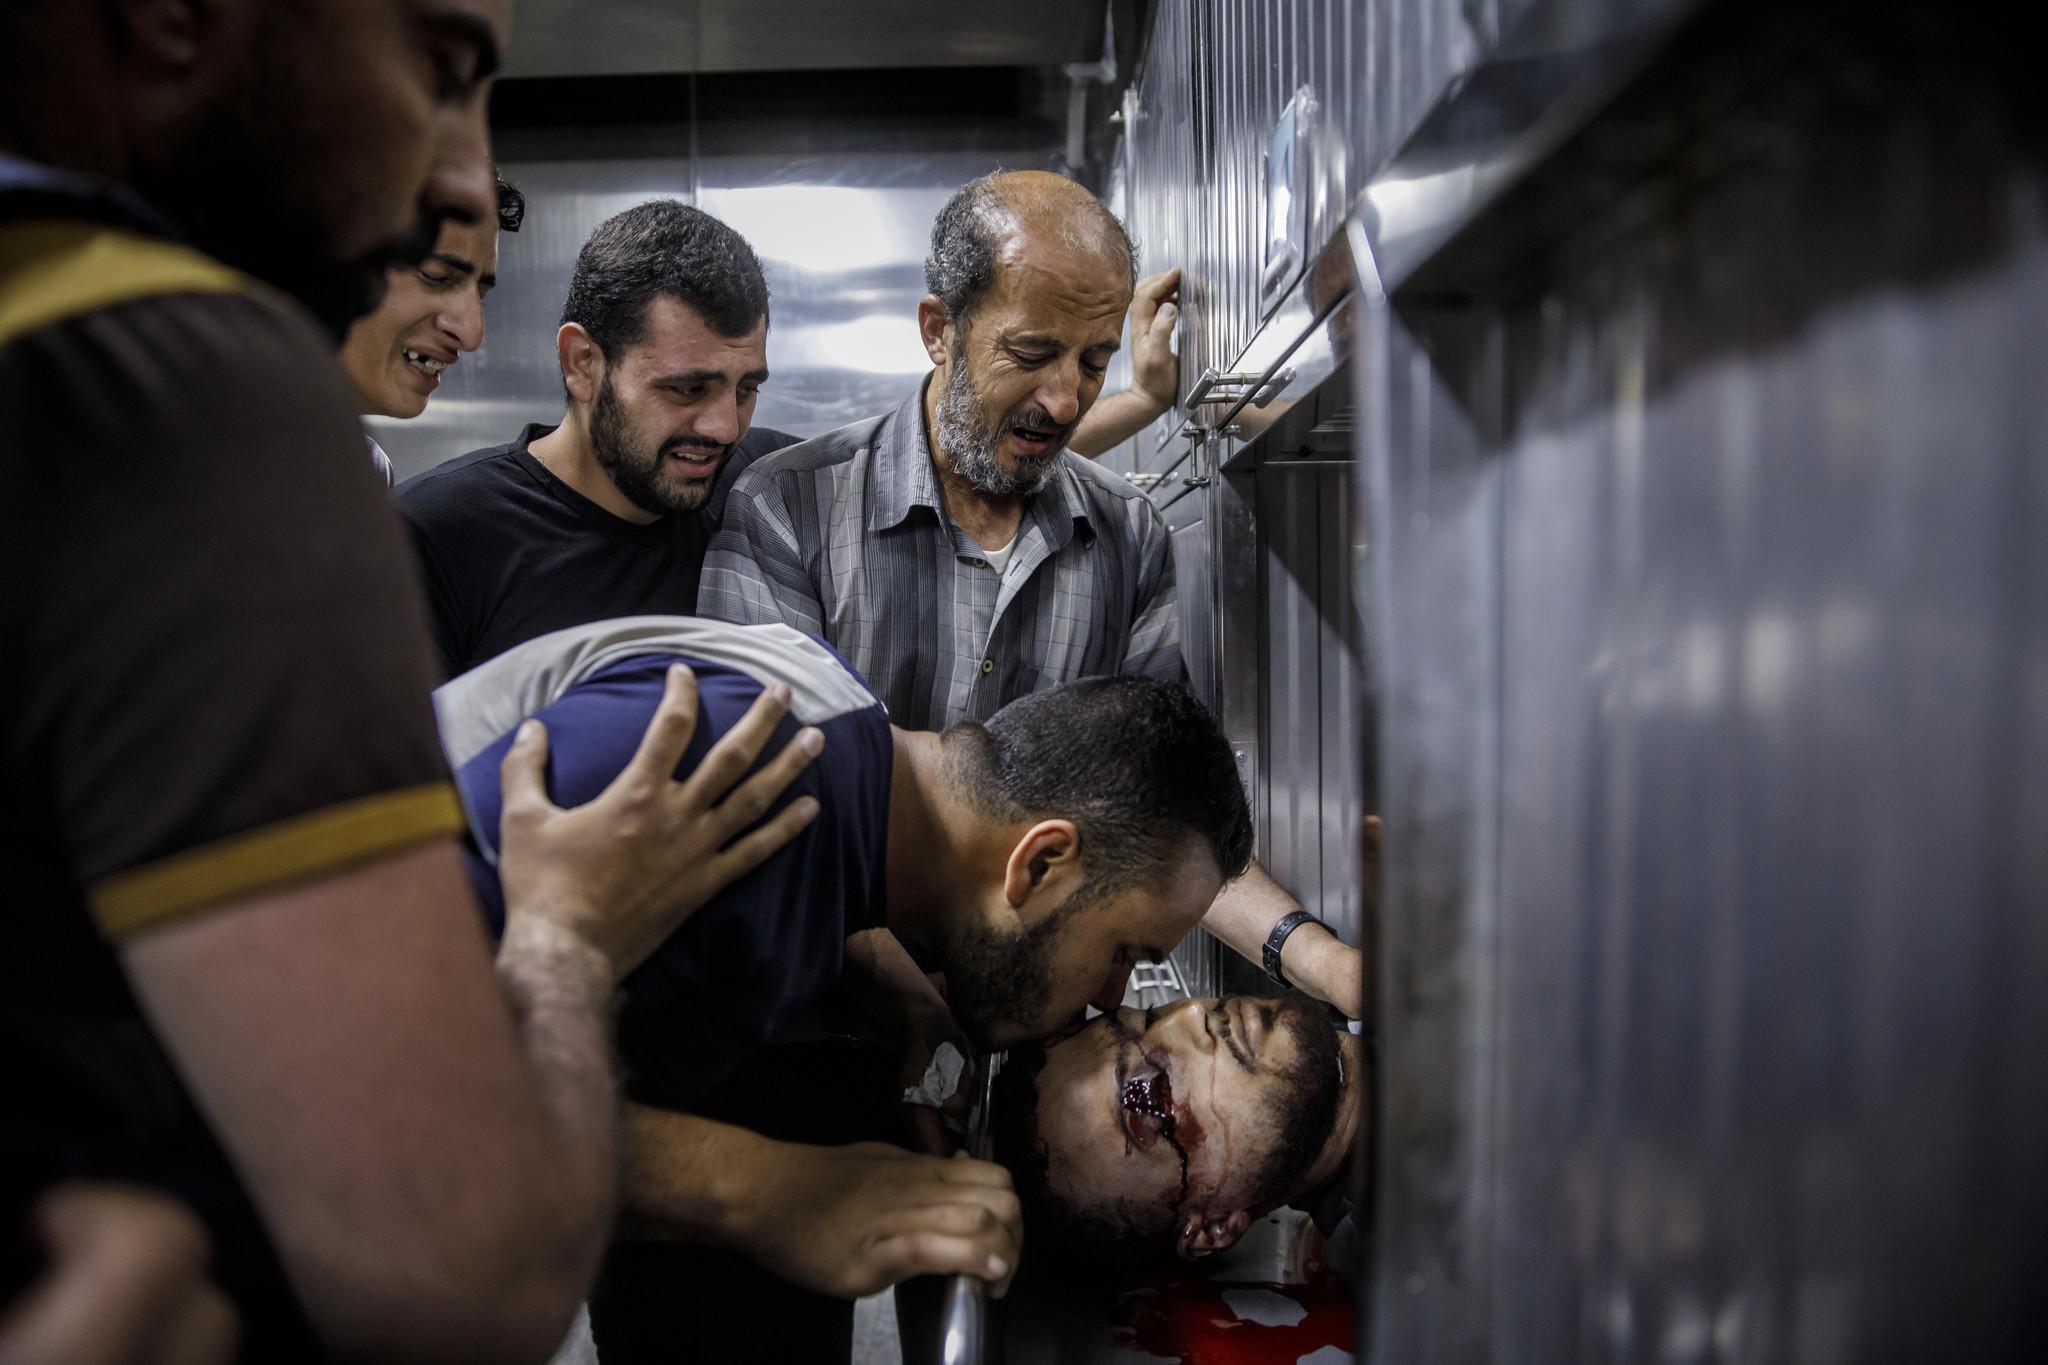 GAZA CITY, GAZA — MONDAY, MAY 14, 2018: Ibraheem Mohammed Al-Tubassi, father, top, and othe family